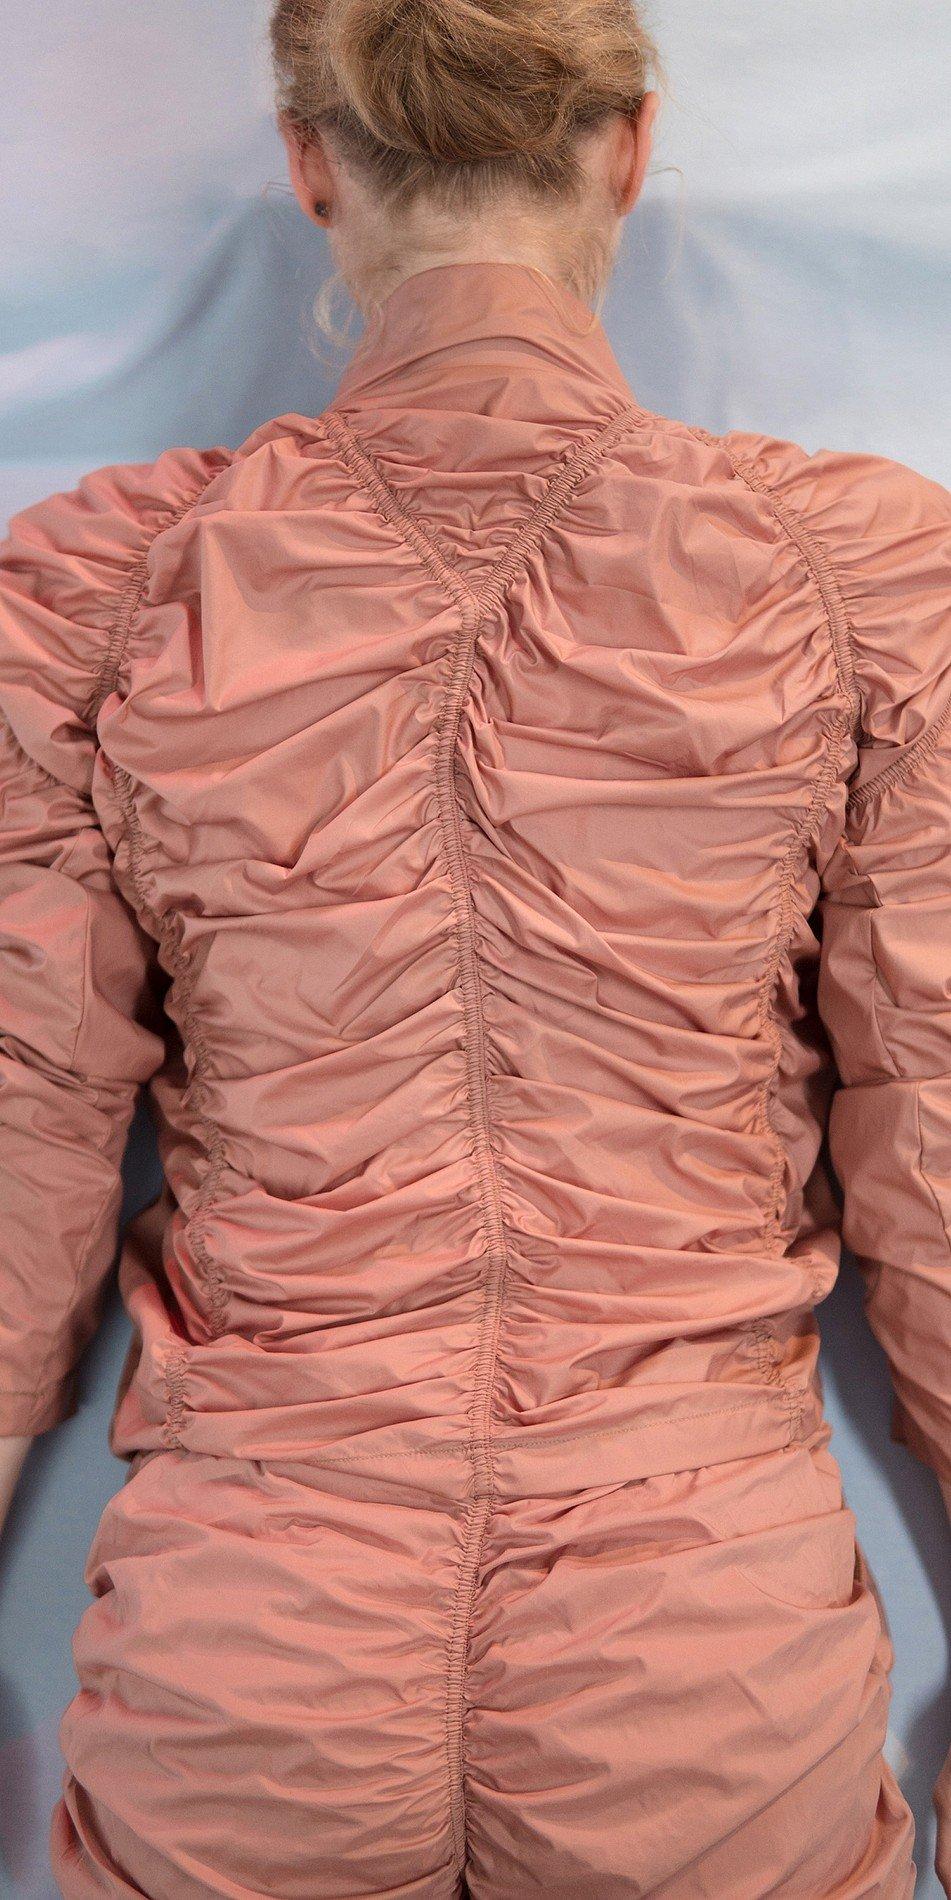 PARA20CUTE draped20blush jecket 3 r 2